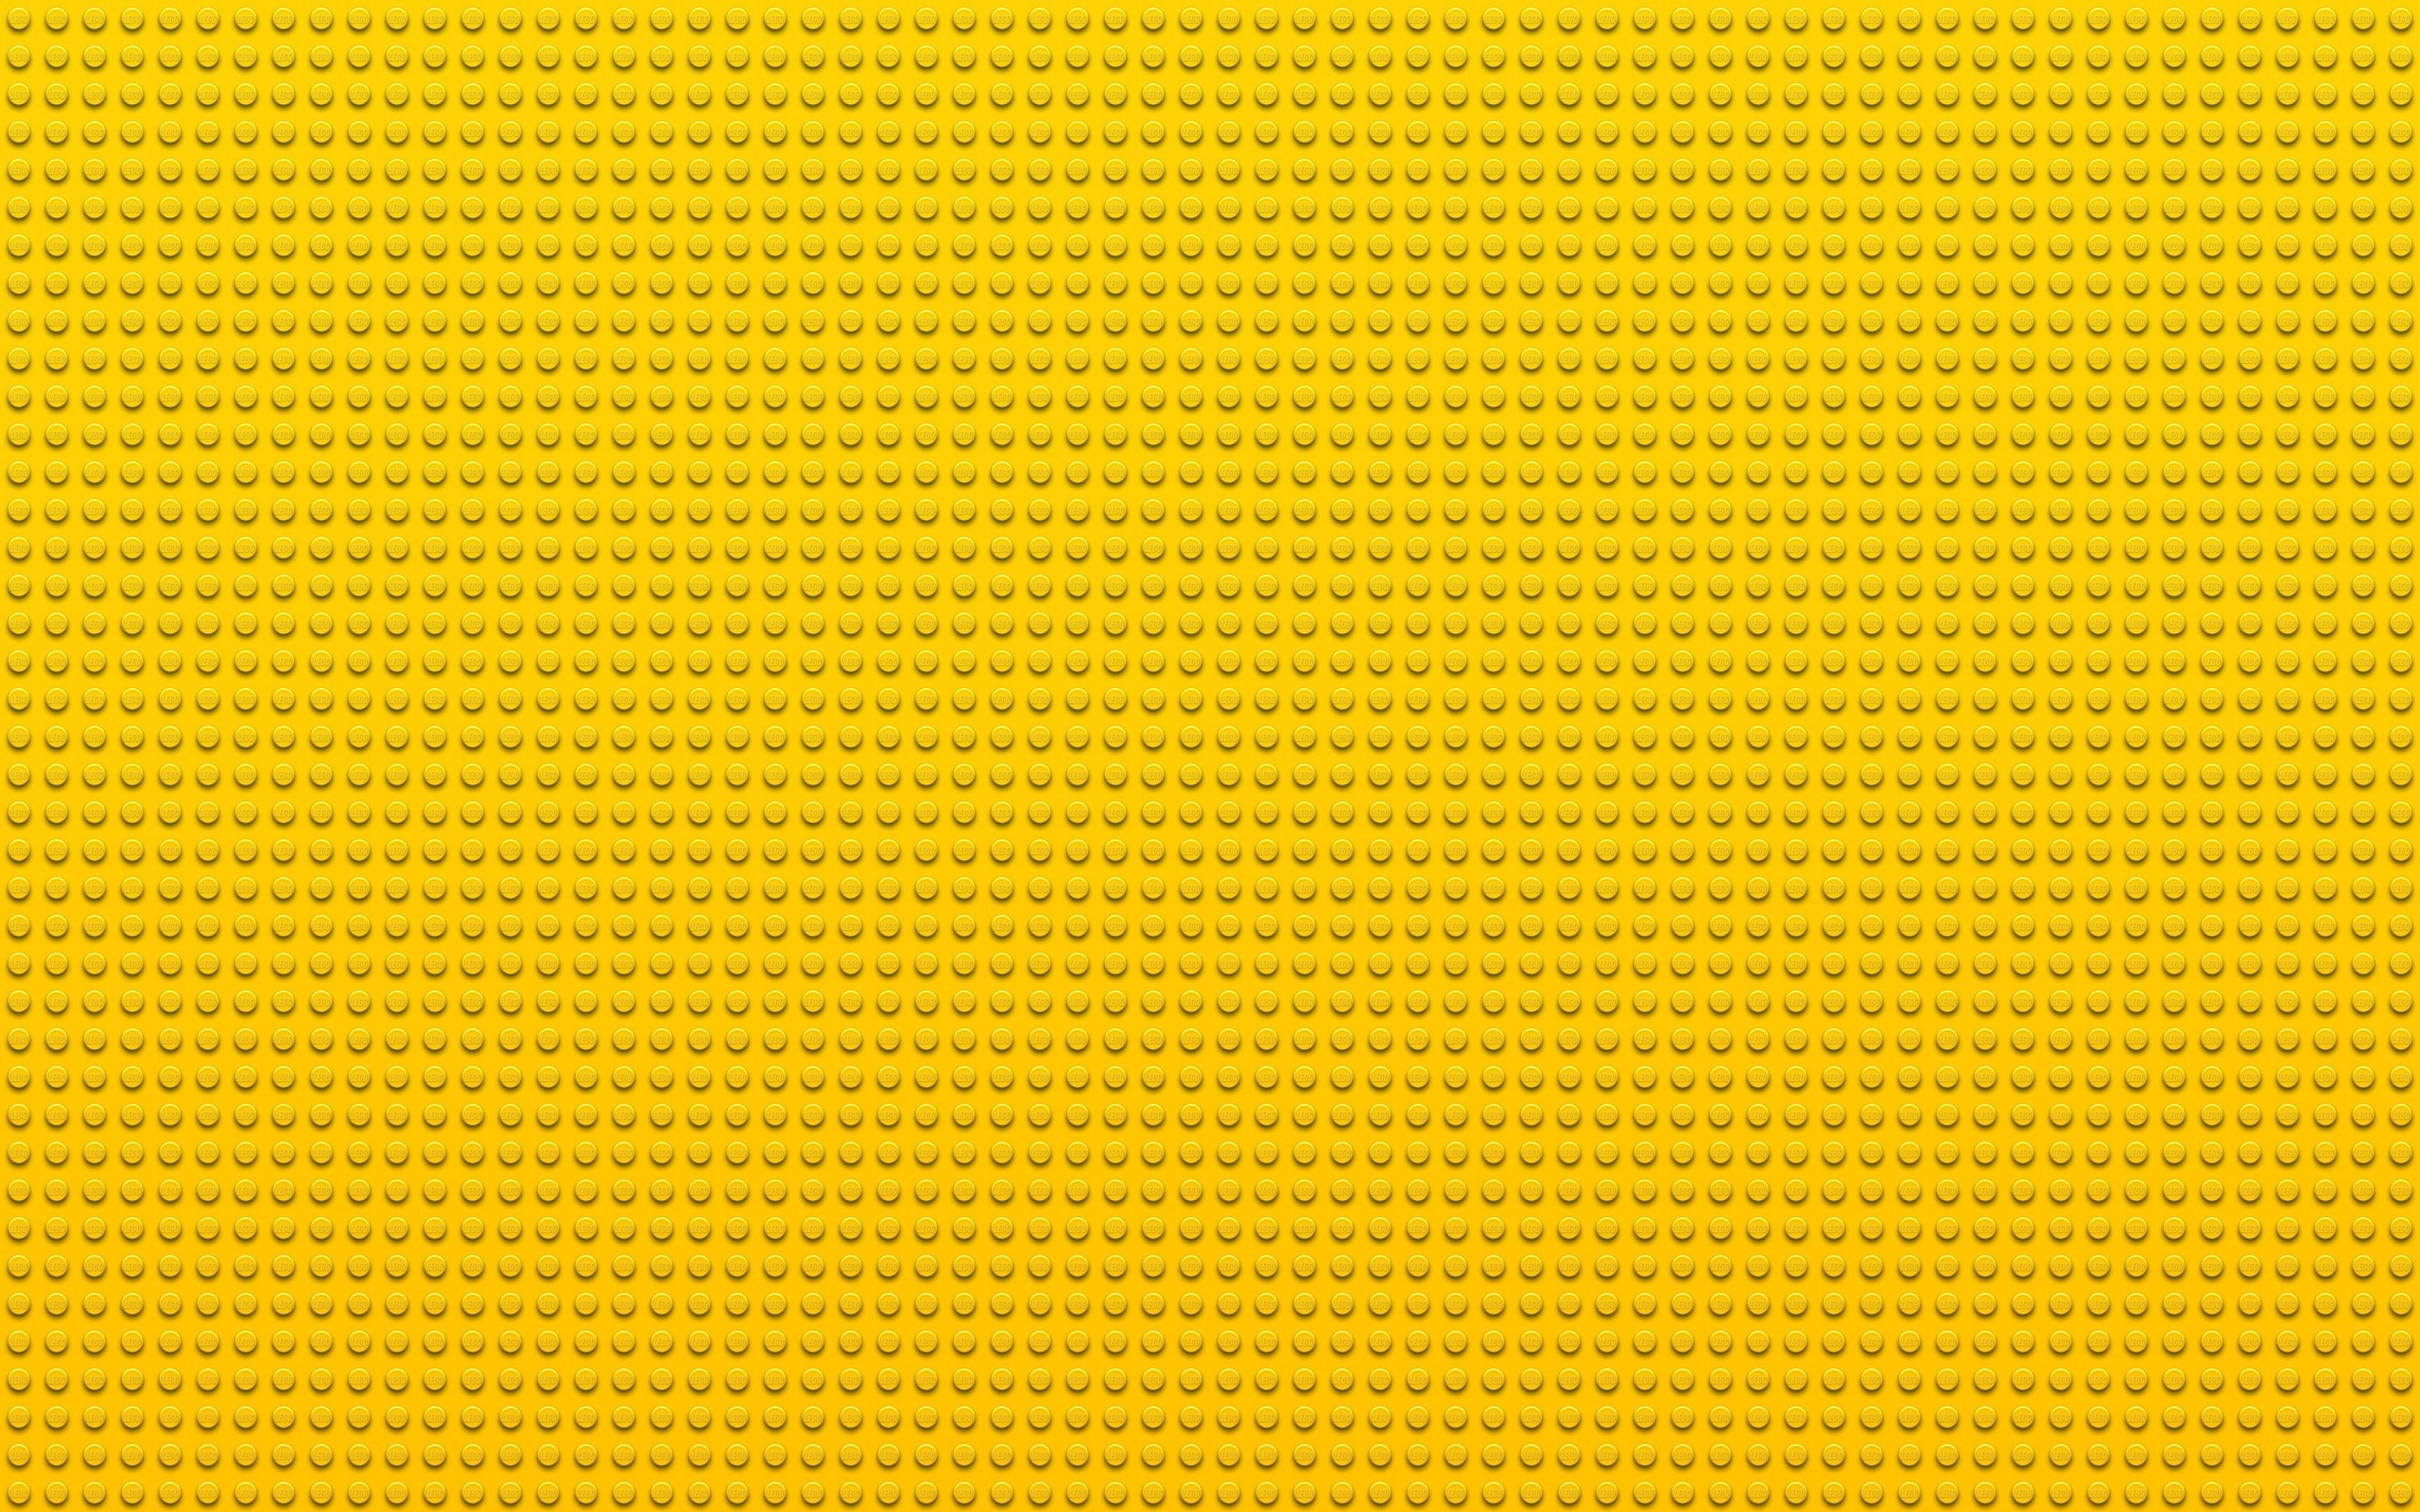 Lego Background Wallpaper Pattern 3840x2400 Wallpaper Teahub Io